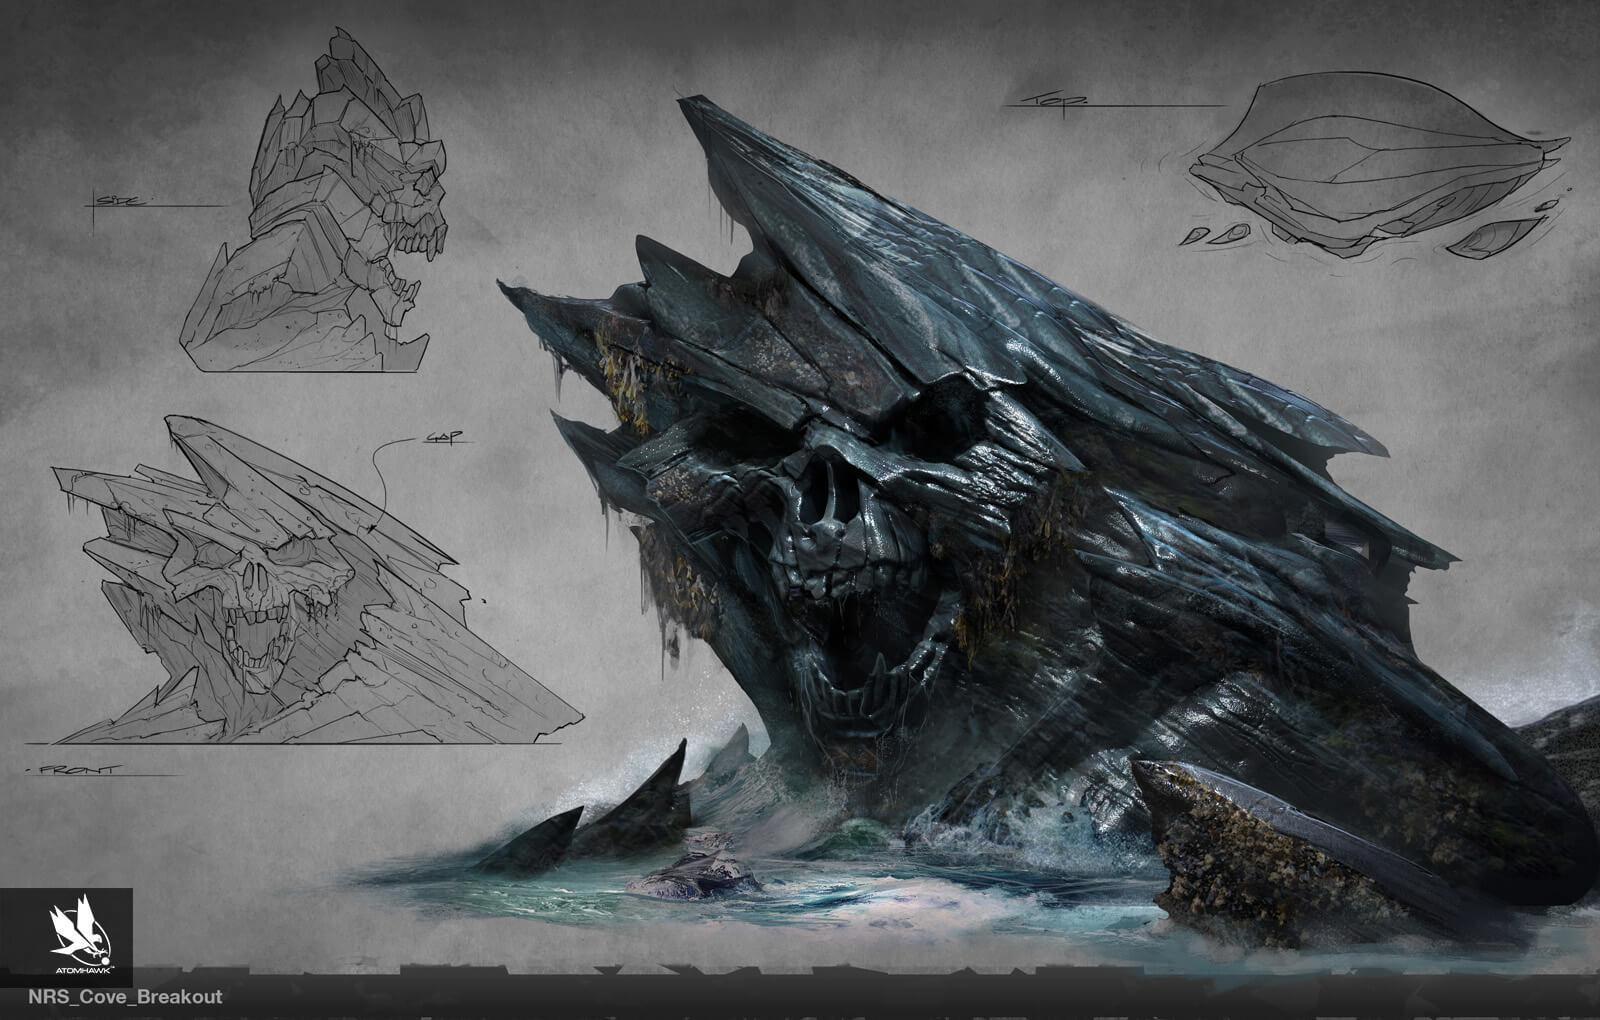 Atomhawk - Mortal Kombat X - Prop Design - Covekull Mountain